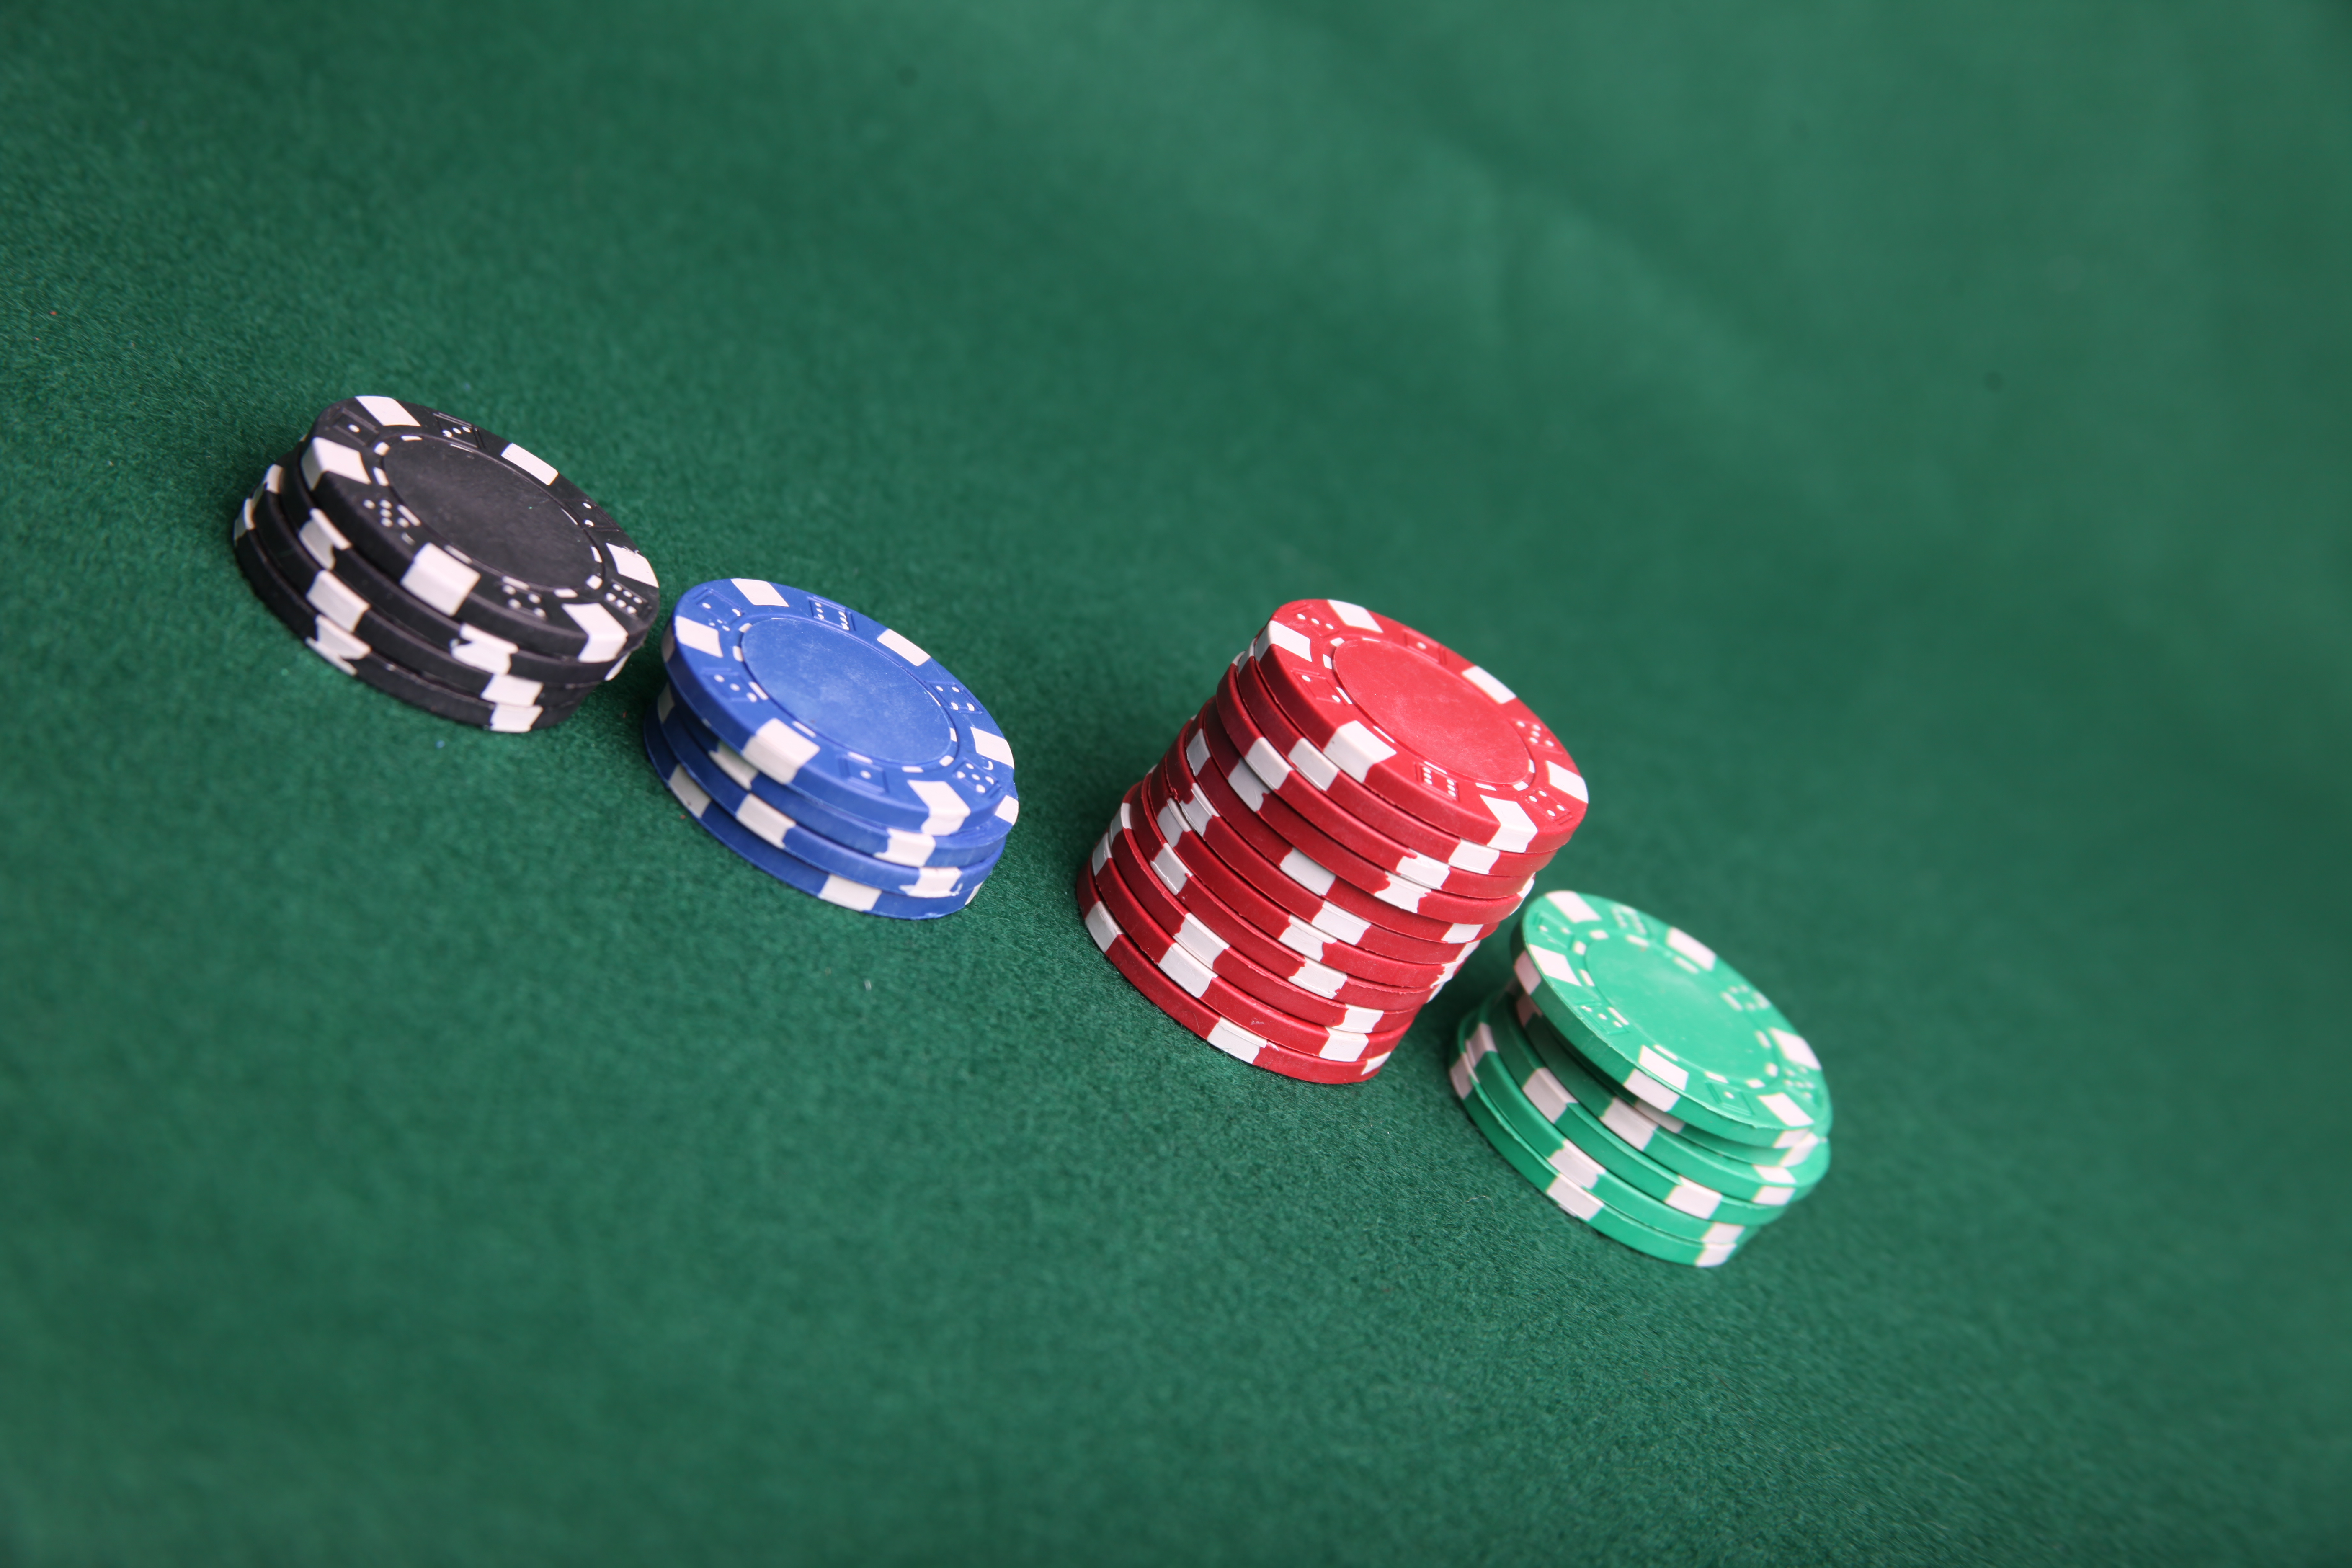 Poker chip stacks, Bet, Black, Blue, Chip, HQ Photo